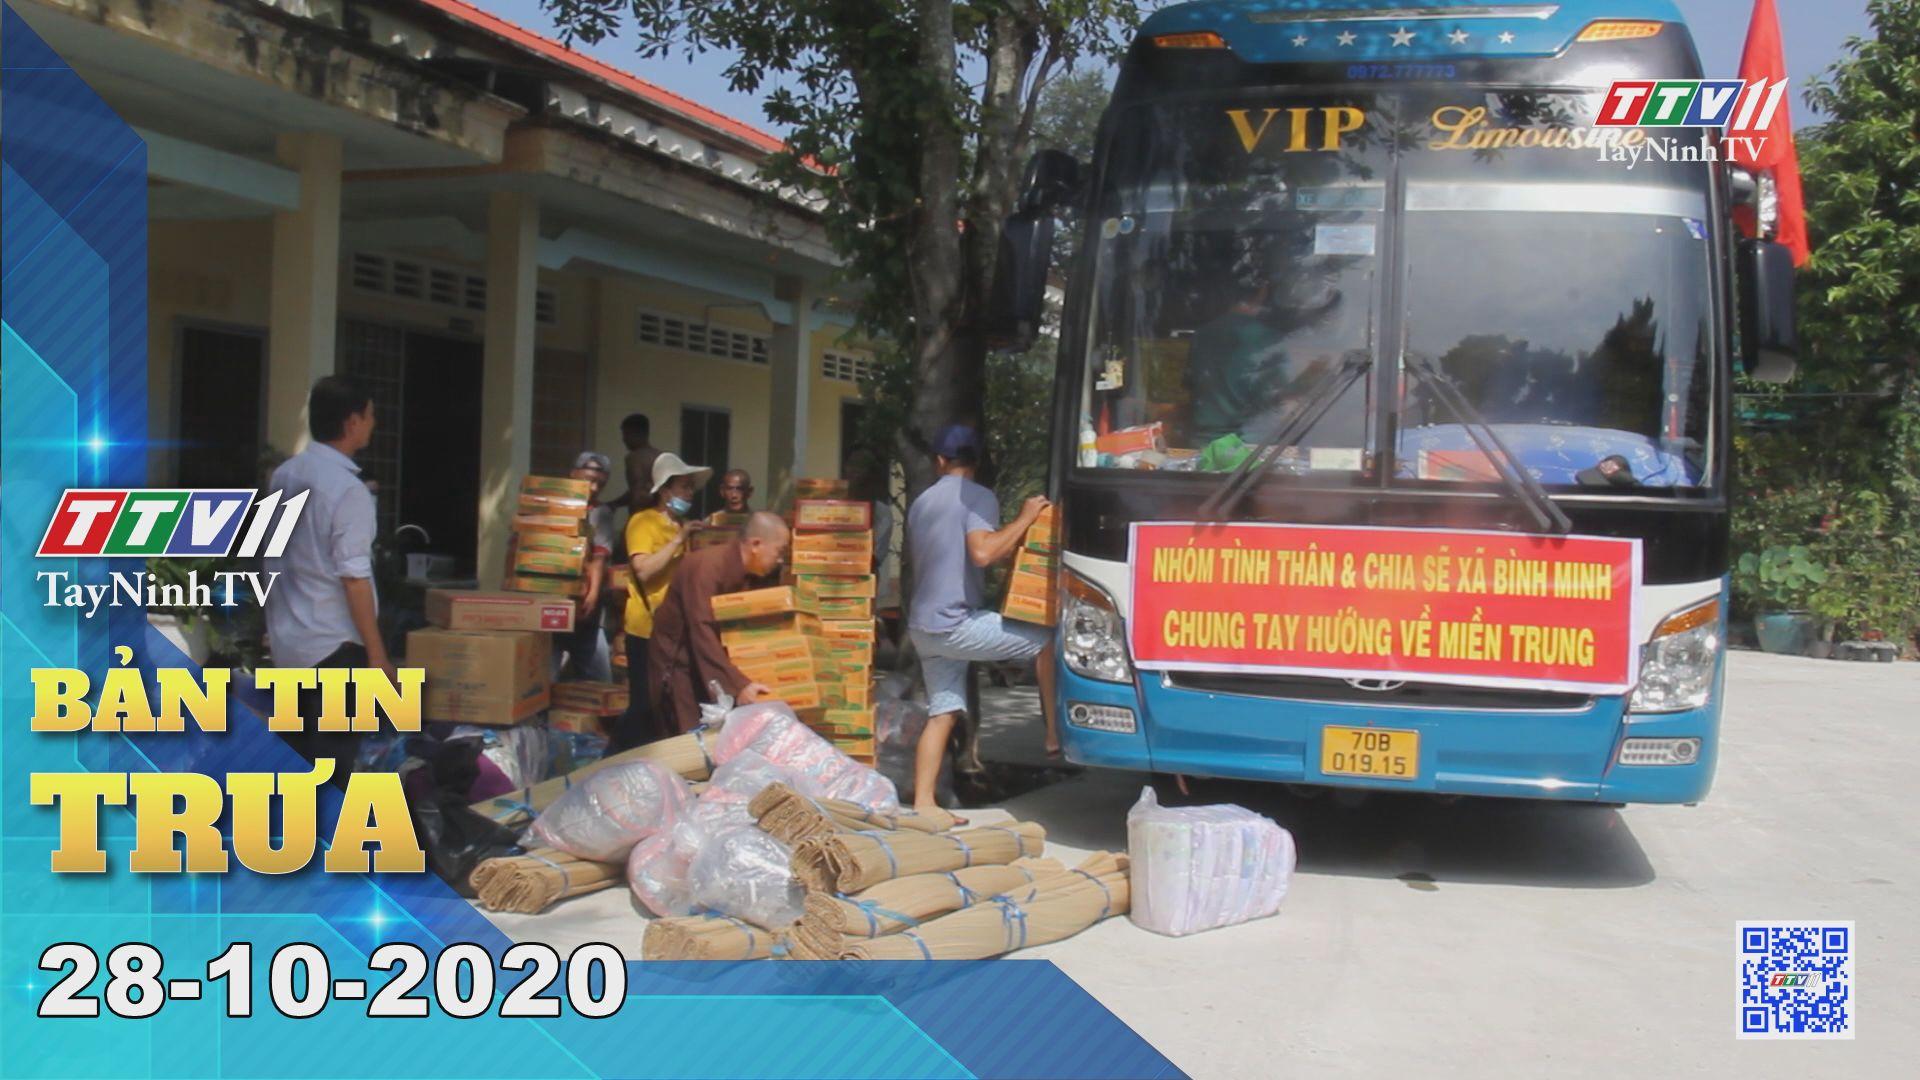 Bản tin trưa 28-10-2020 | Tin tức hôm nay | TayNinhTV